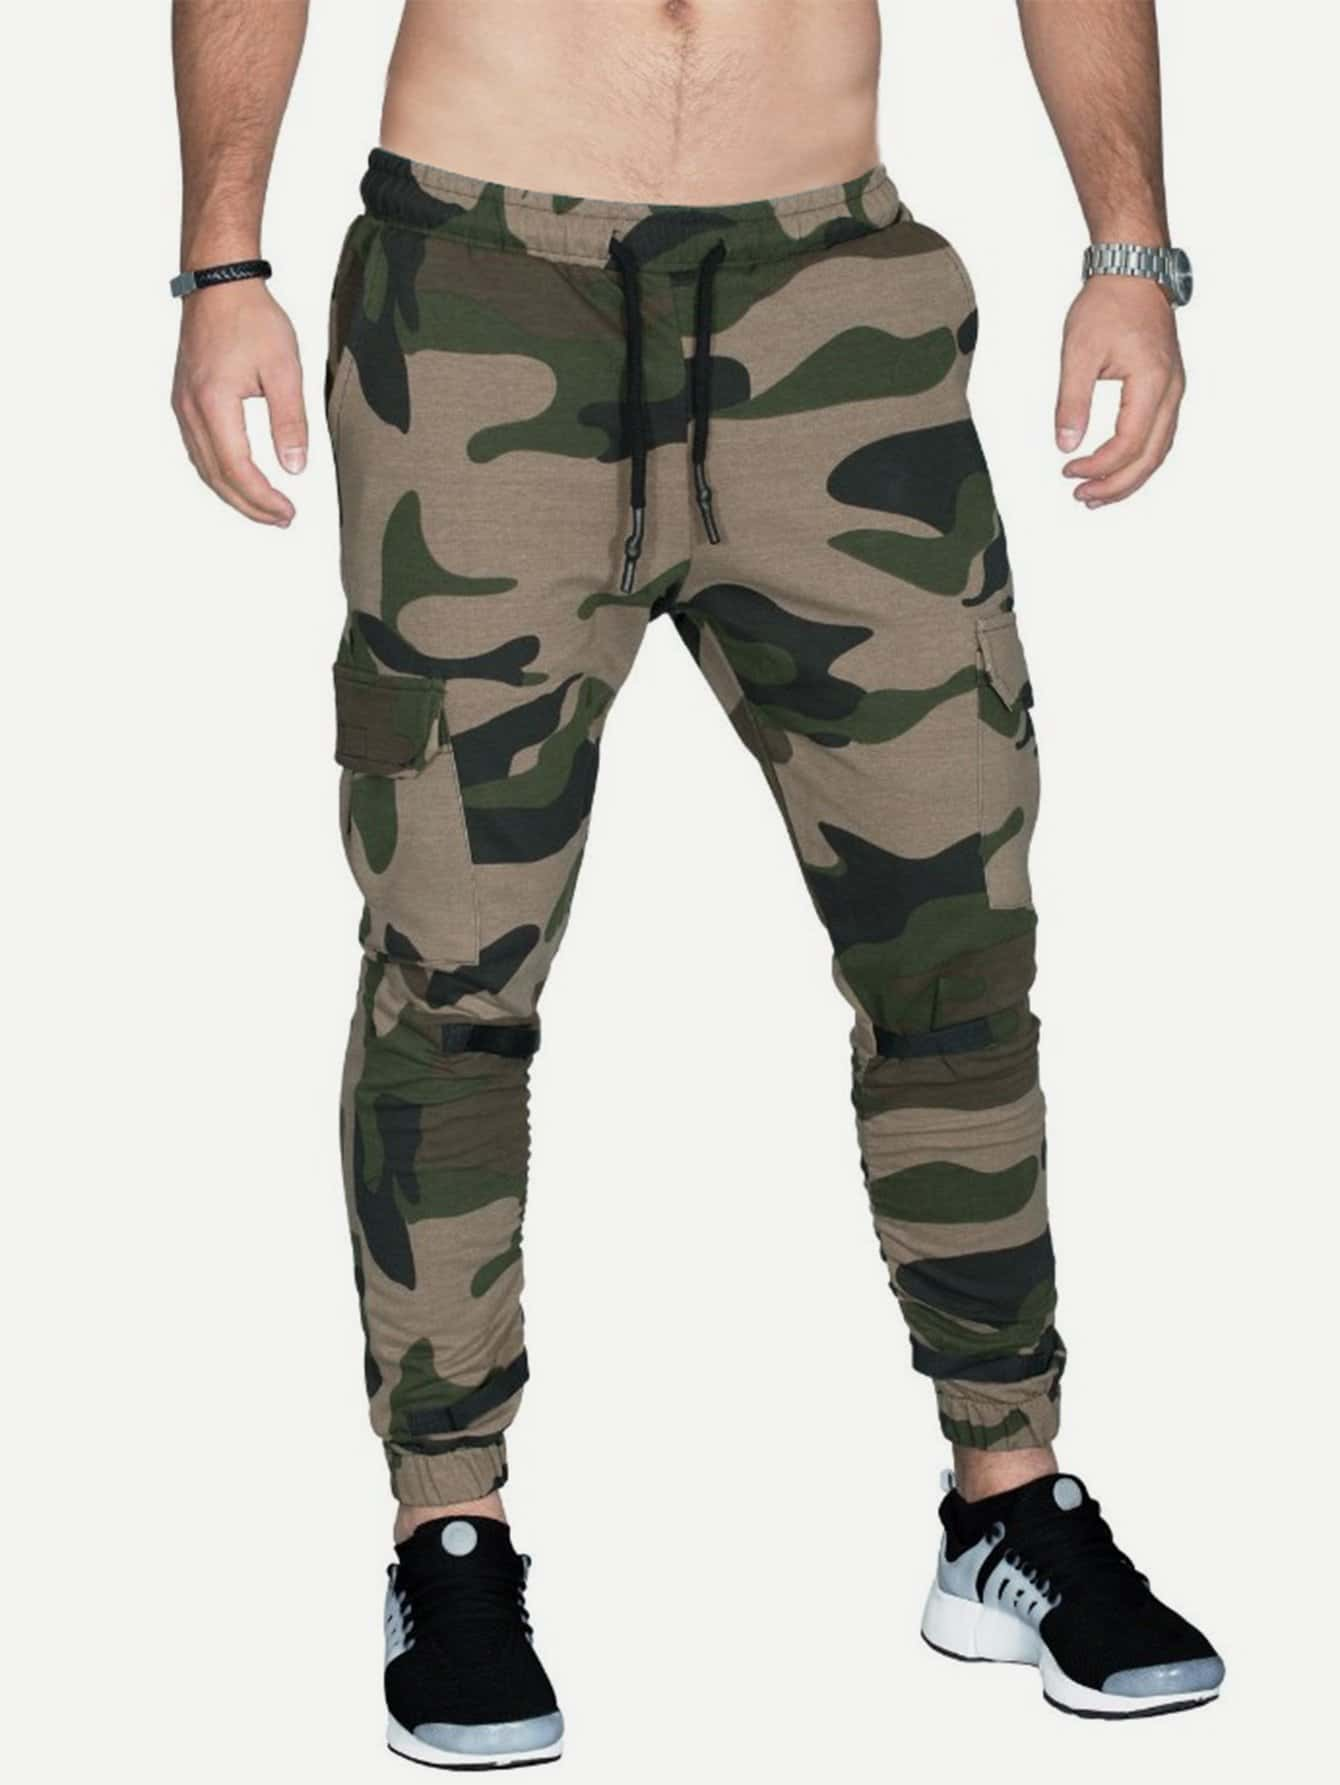 Men Pockets Decoration Camo Drawstring Pants